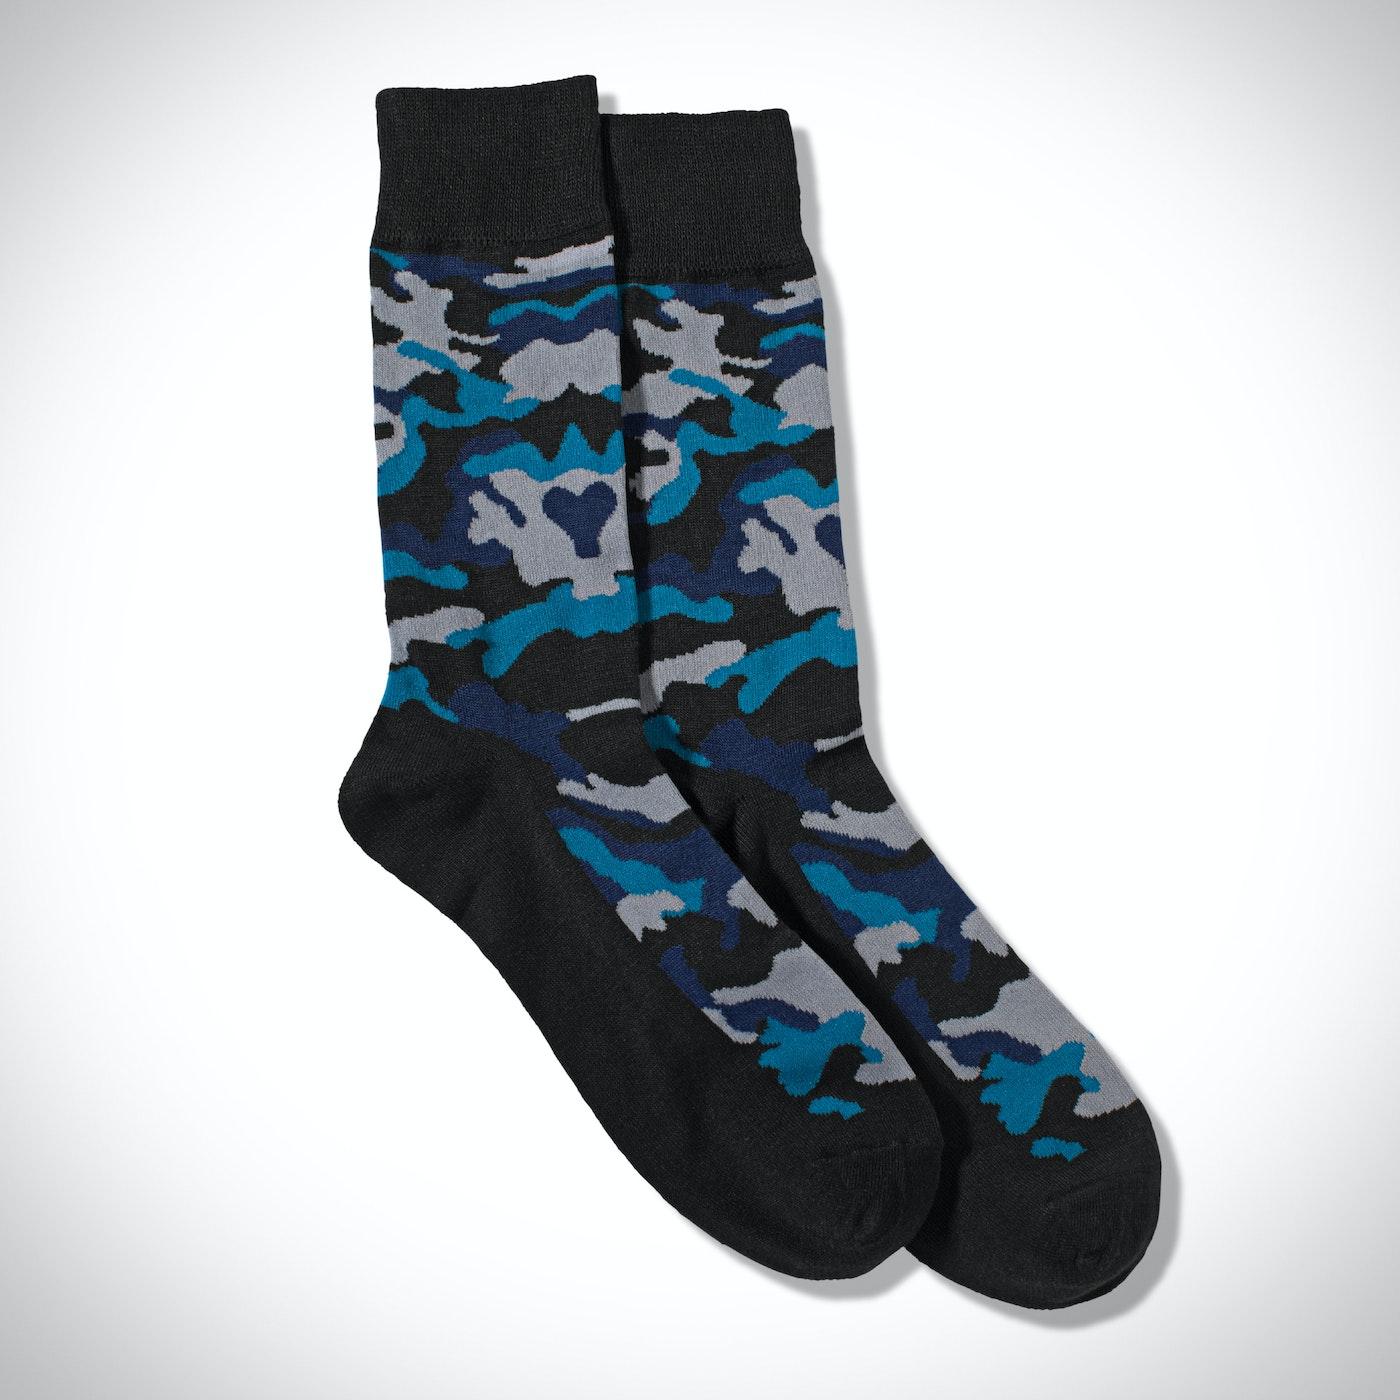 Blue Camo Print Socks